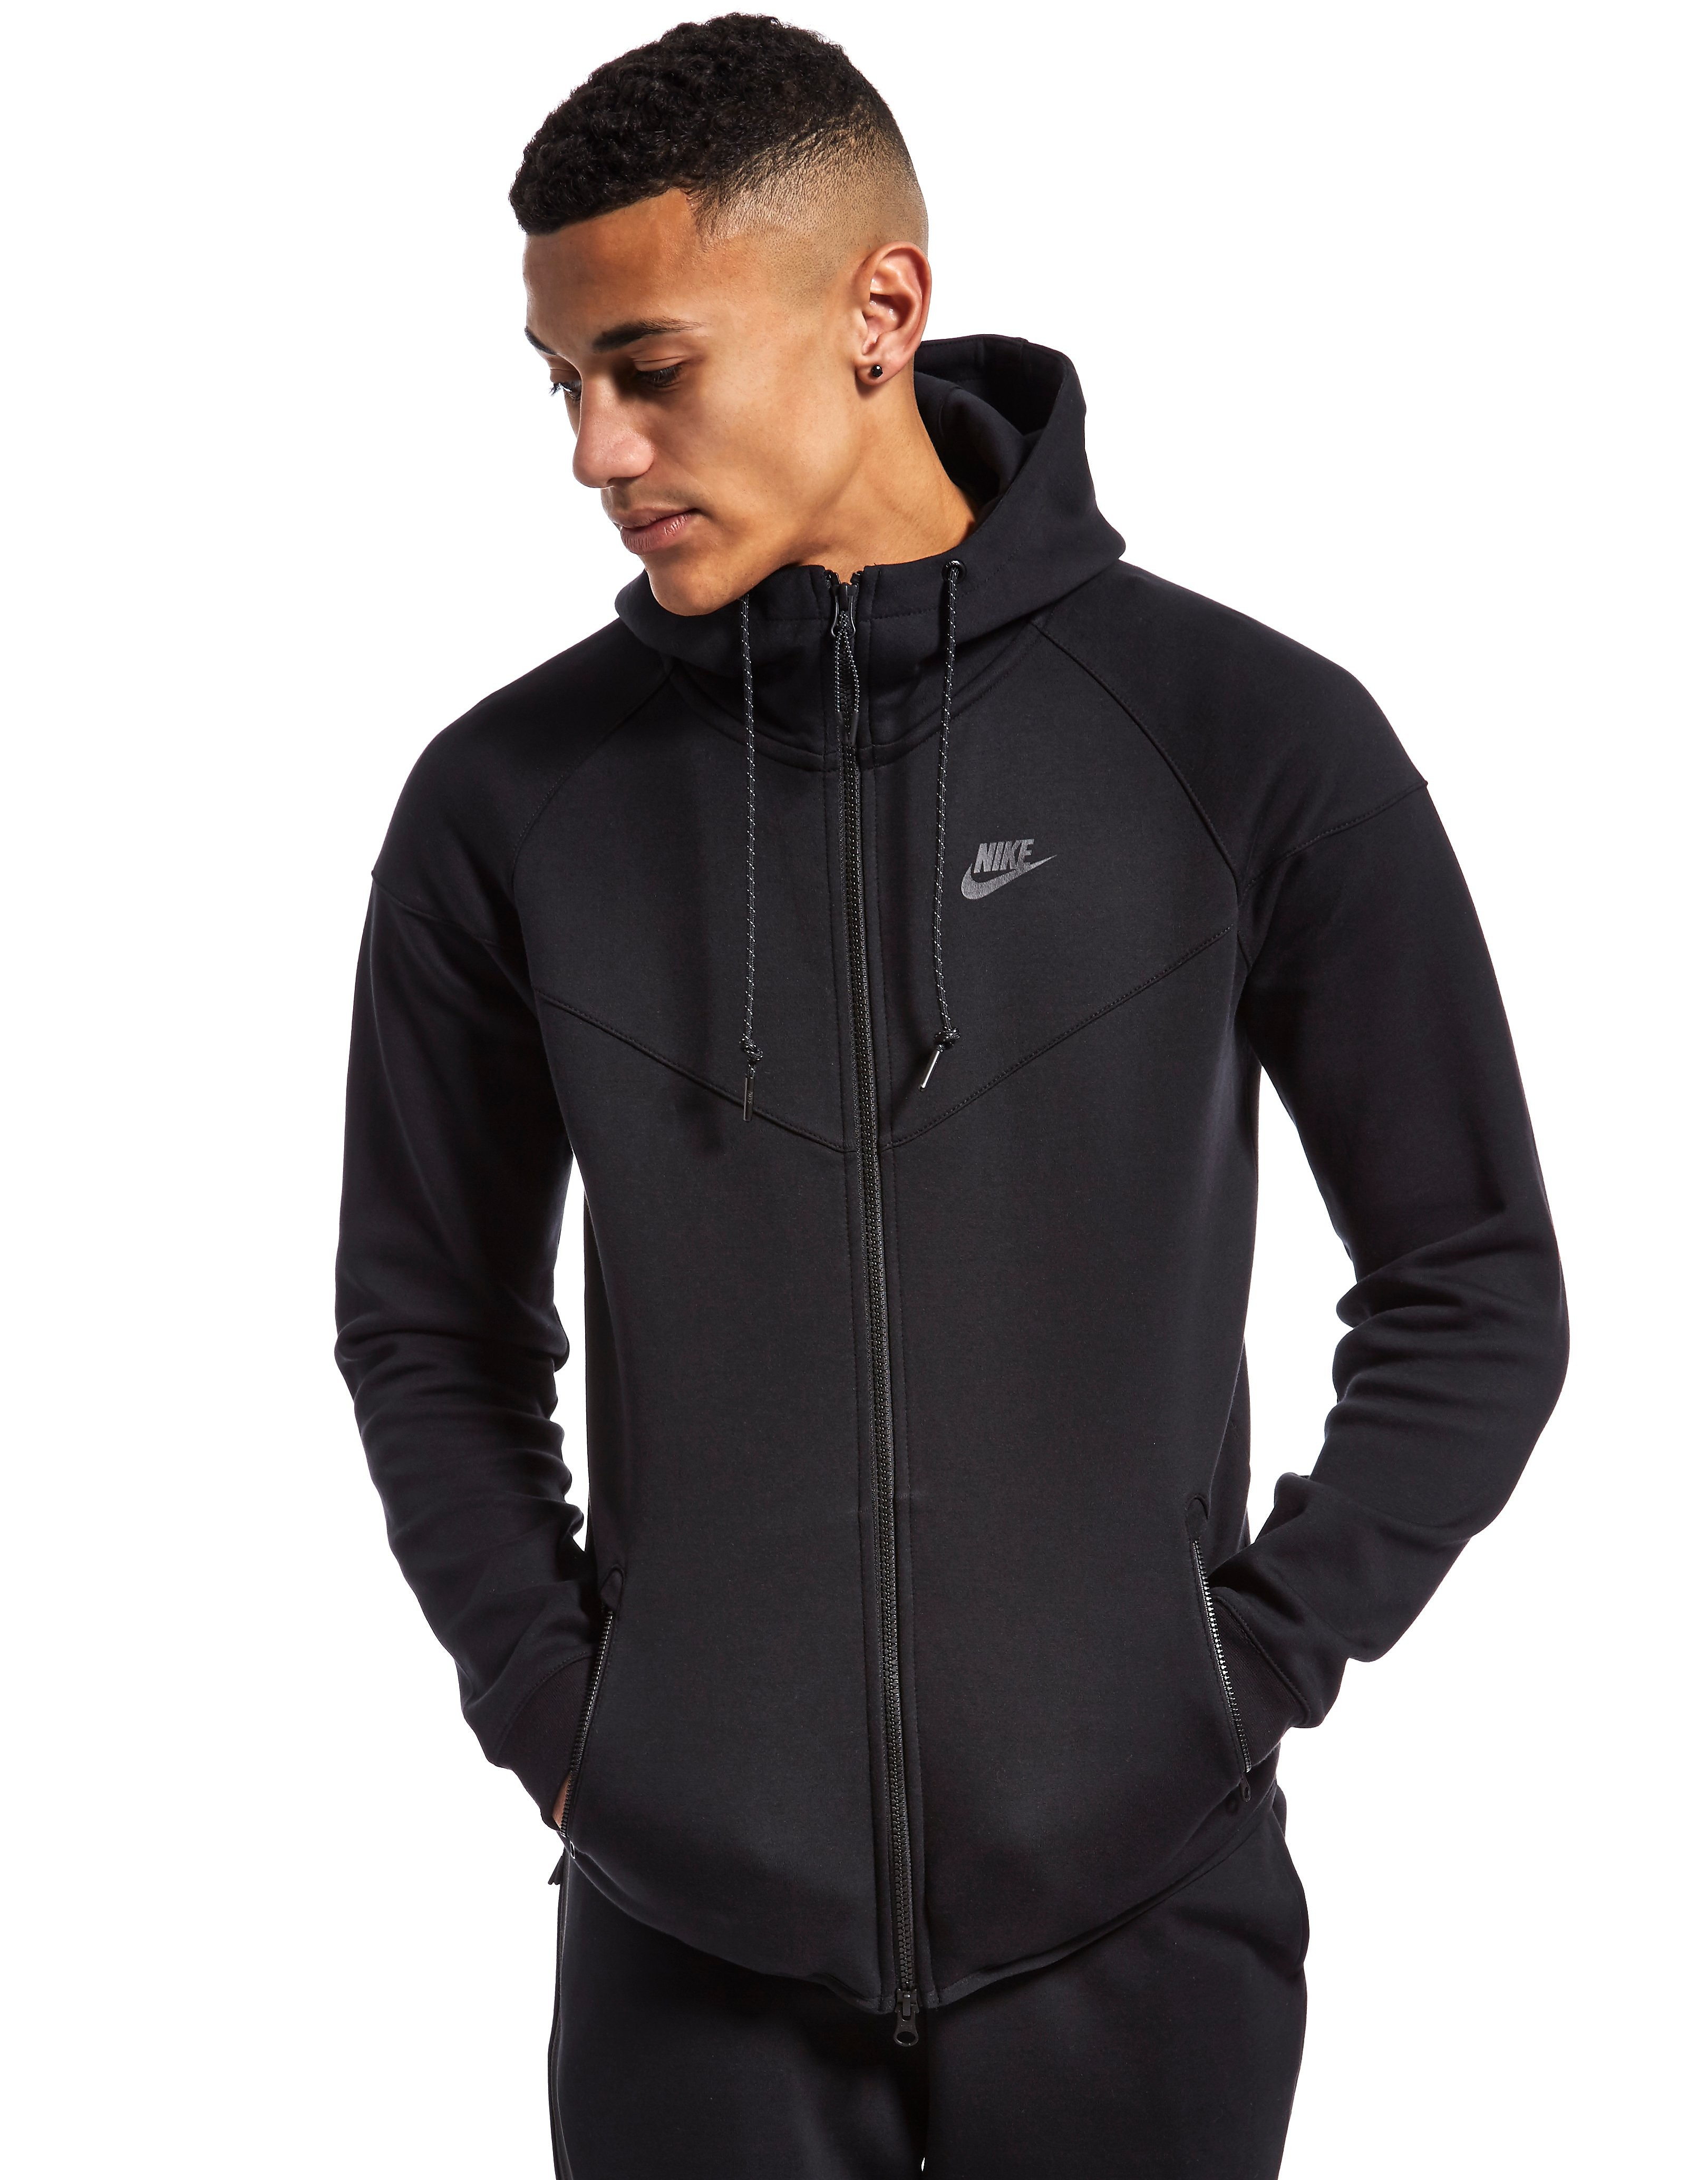 men 39 s hoodies zip up hoodies and pullover hoodies jd sports. Black Bedroom Furniture Sets. Home Design Ideas